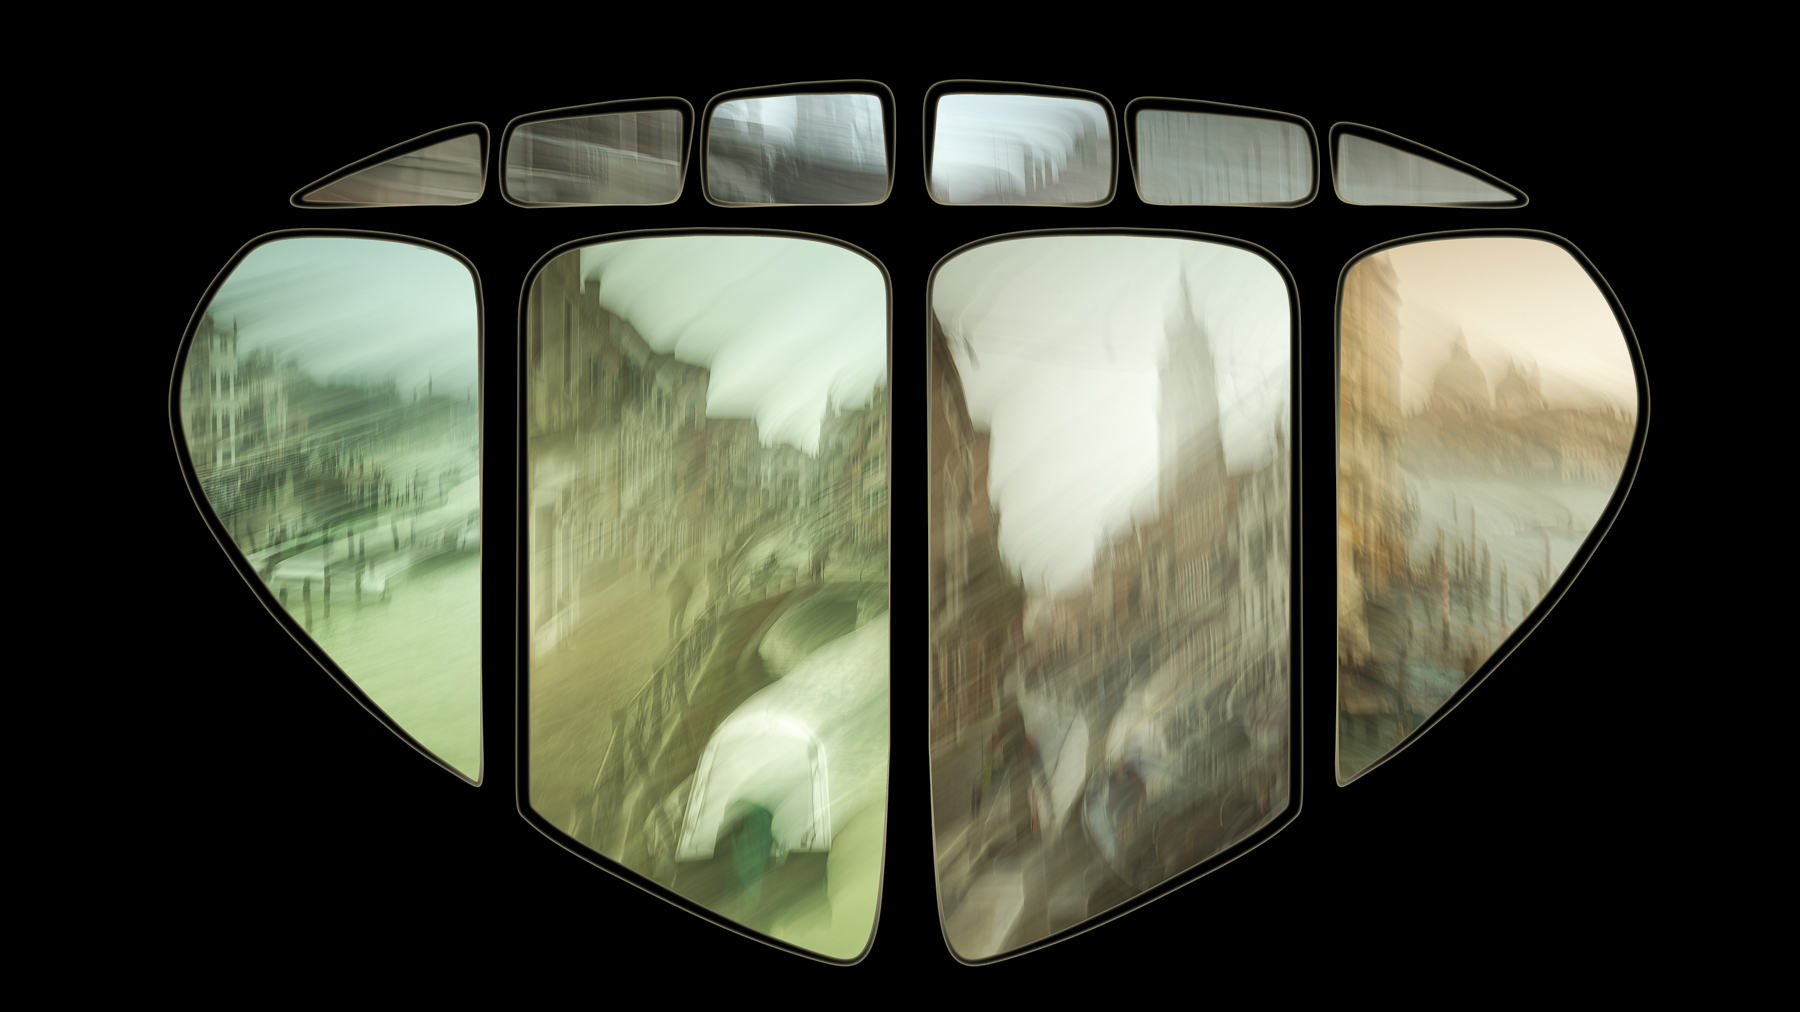 Danie_Munteanu_Polyptych Compositions_Pale Window_6.jpg